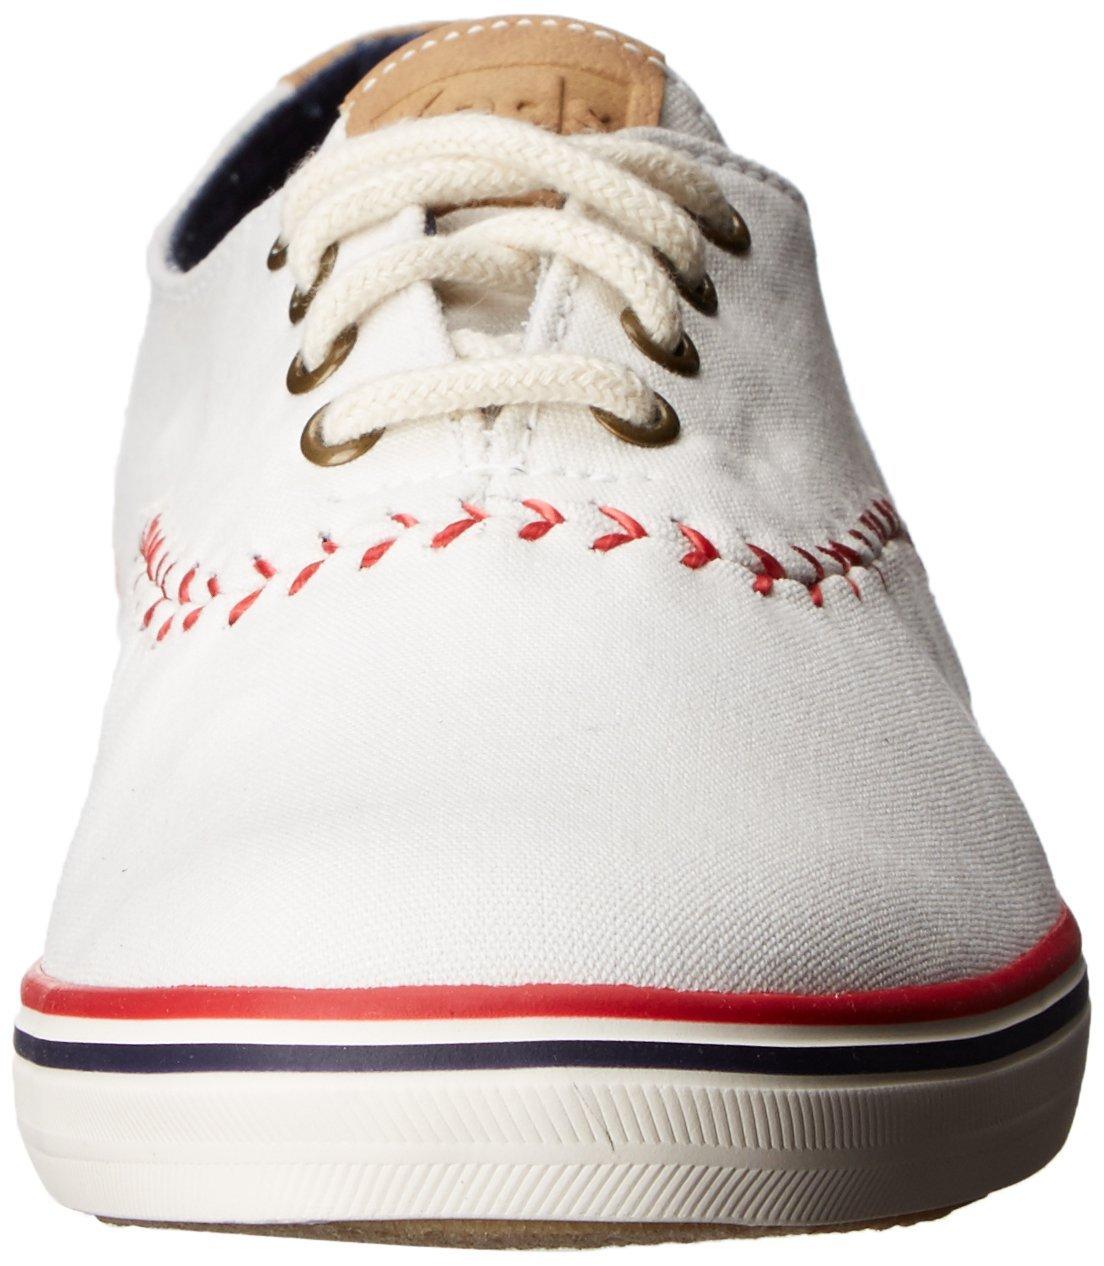 3284ba0cb56 ... Keds Women s Champion MLB Pennant Baseball Baseball Baseball Fashion  Sneaker B01AAIWHR0 6.5 M US